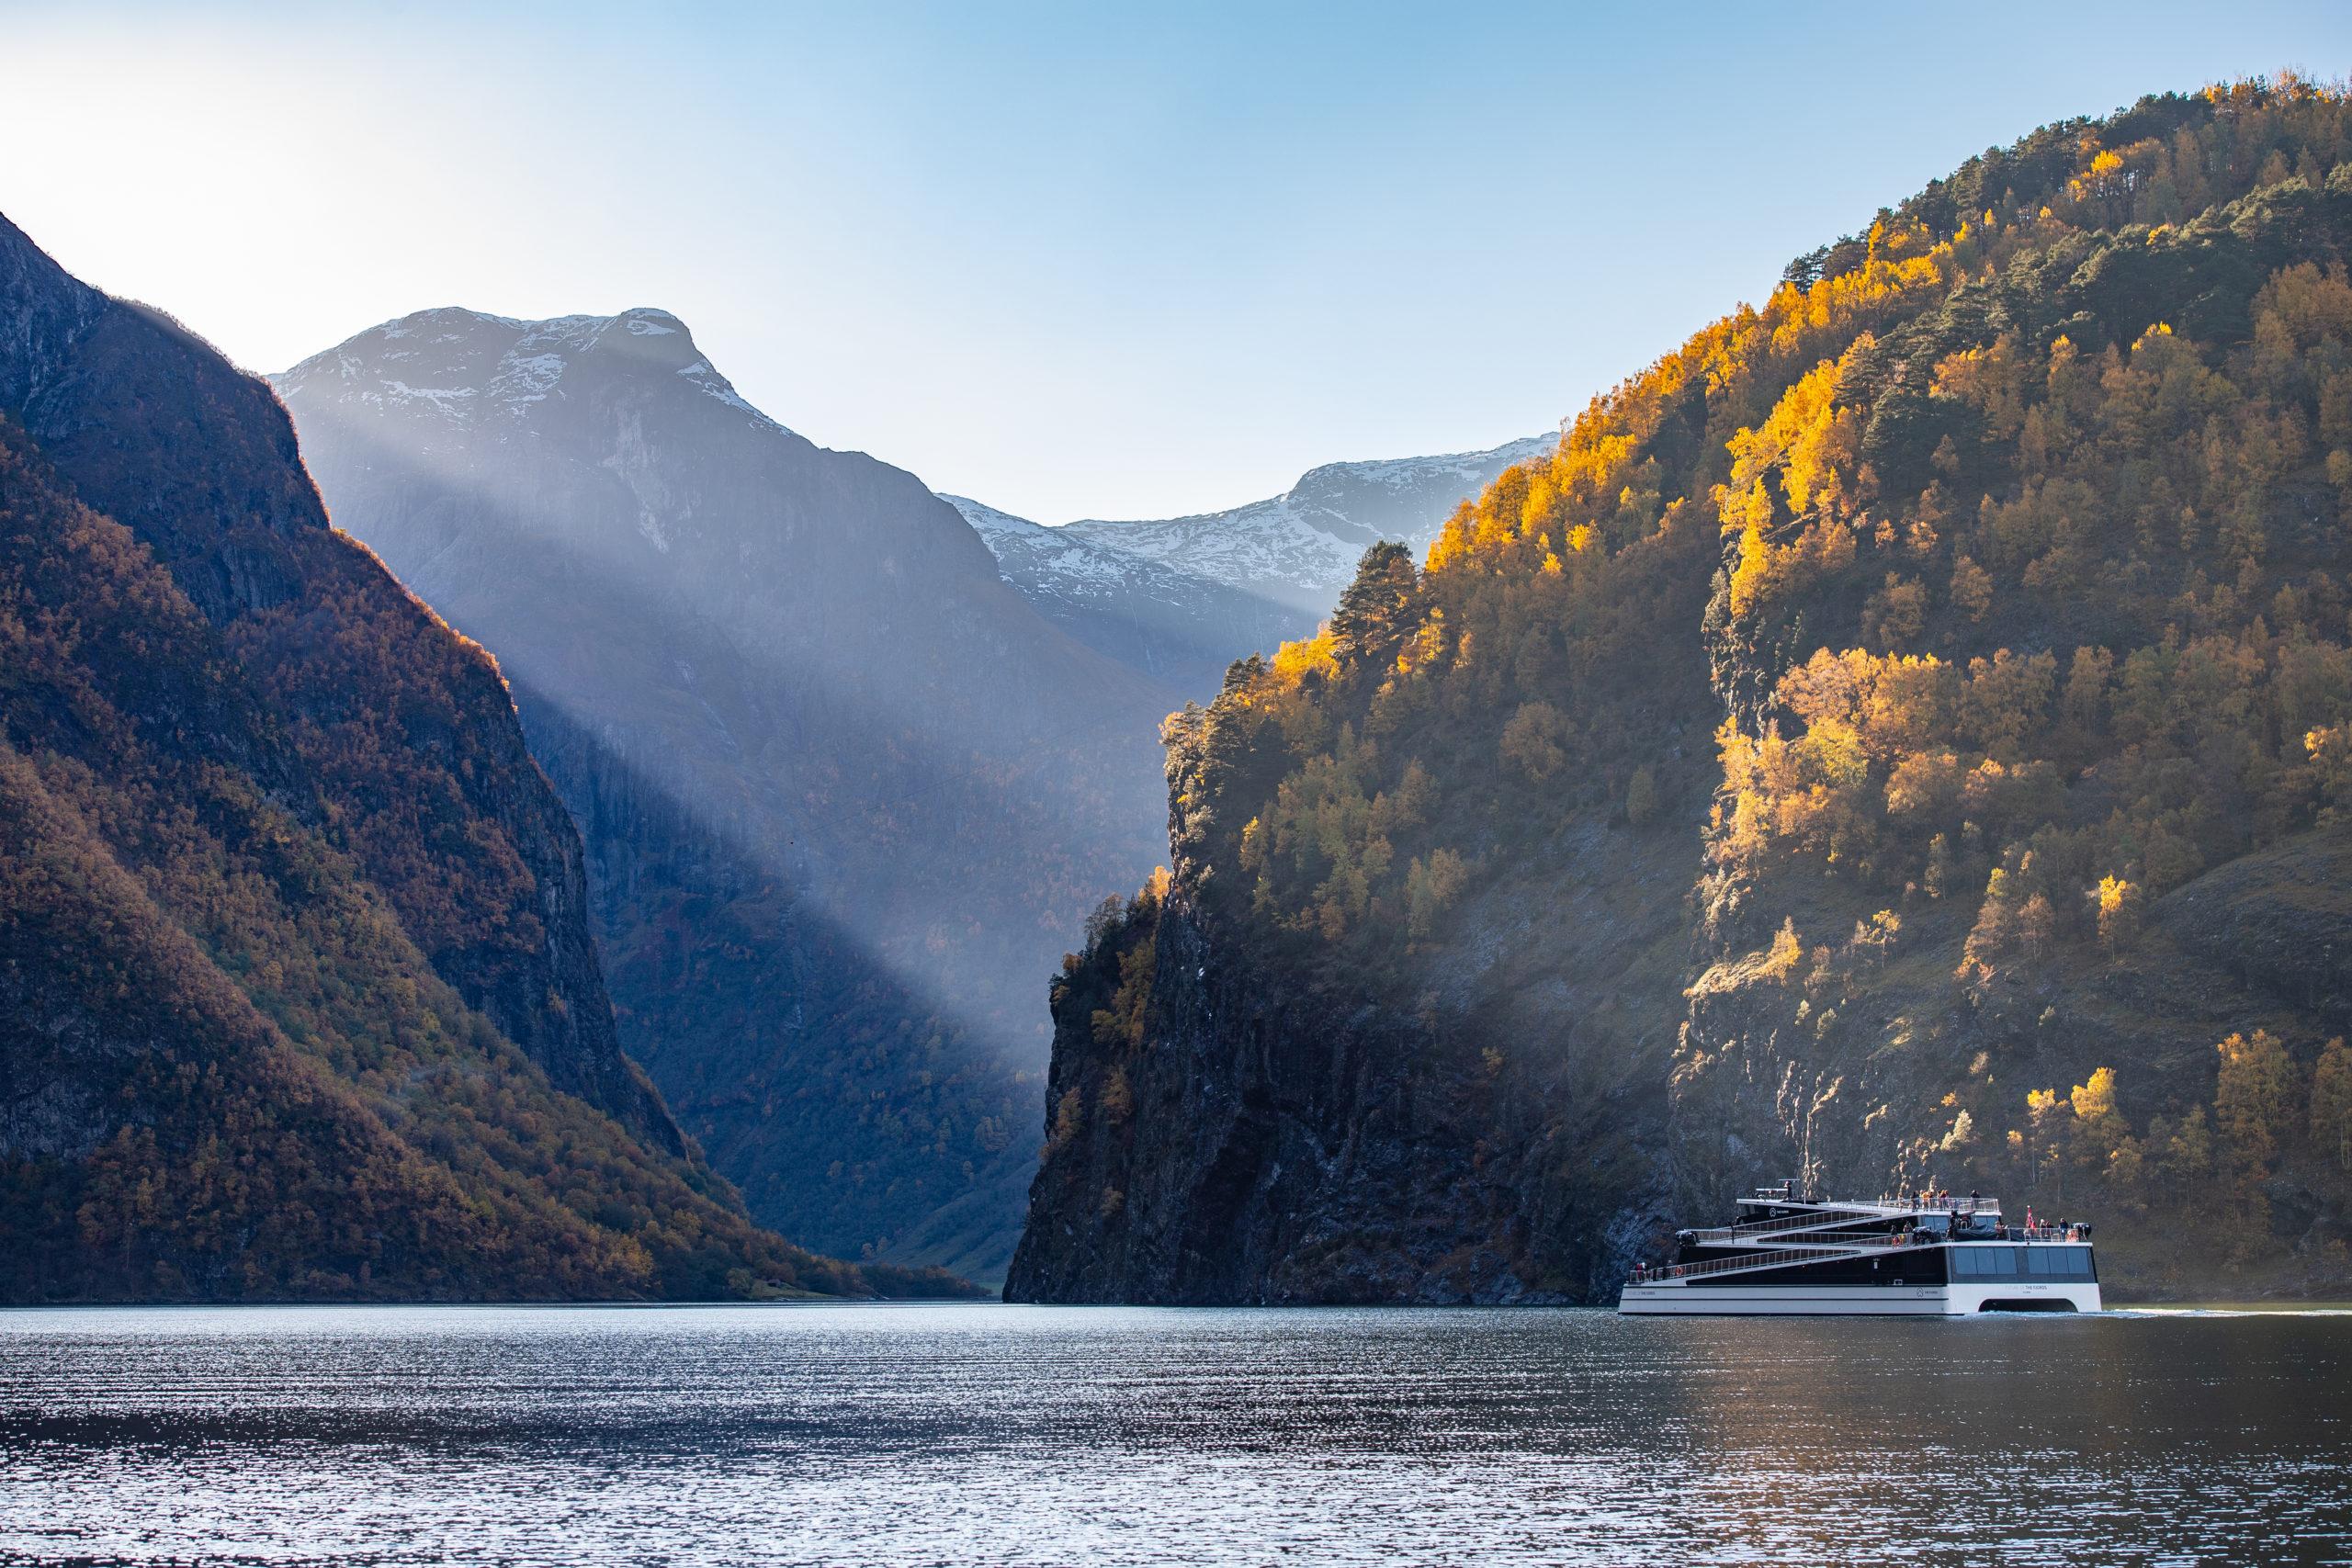 autumn_naeroyfjorden_future_fjordcruise_fjord_sverrehjornevik-9611-scaled.jpg